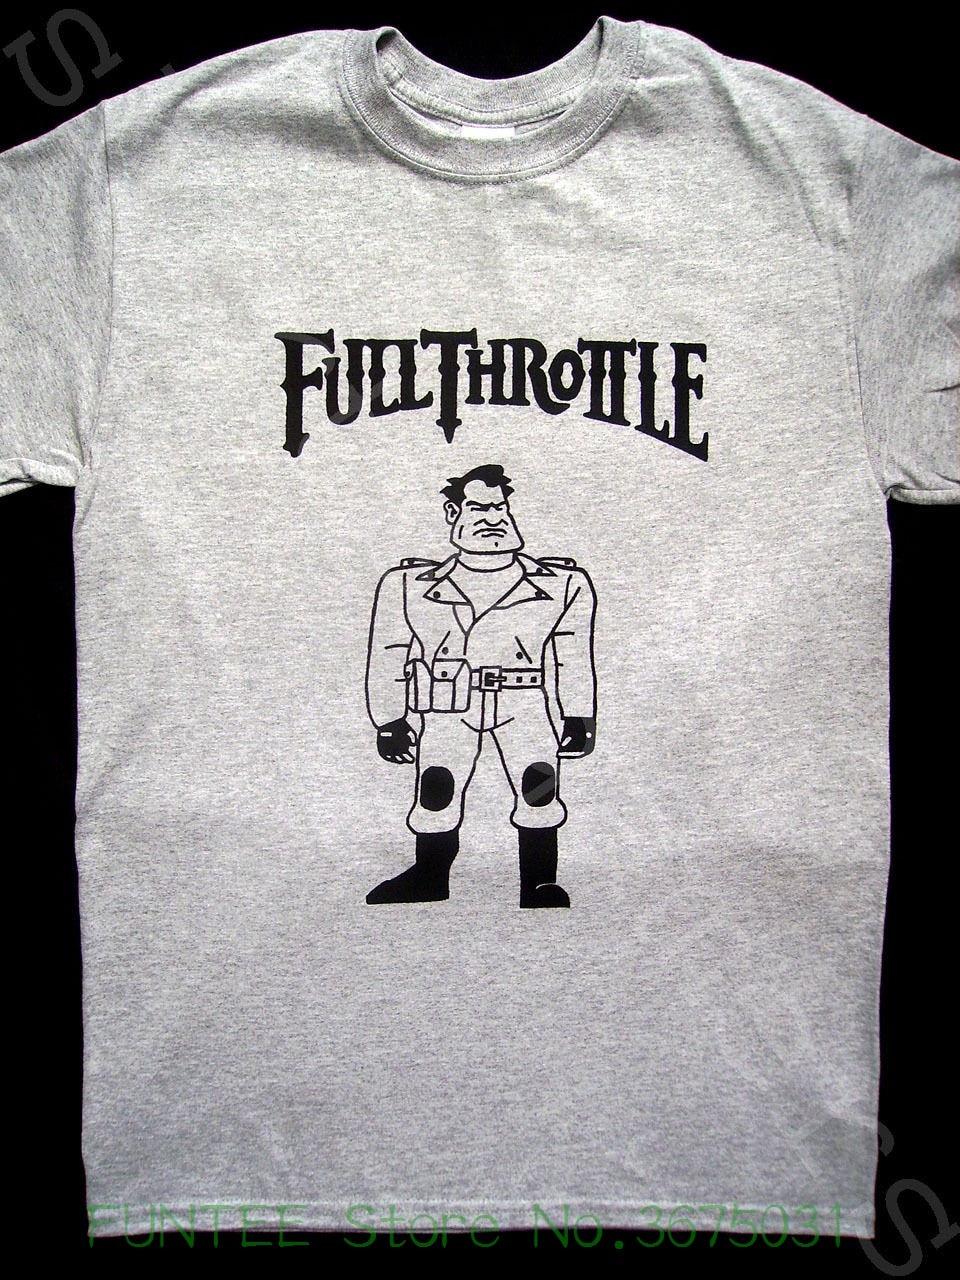 8c2ade8f045 Women s Tee Full Throttle T Shirt ( Maniac Mansion Loom Lucasarts Grim  Fandango Day Tentacle )